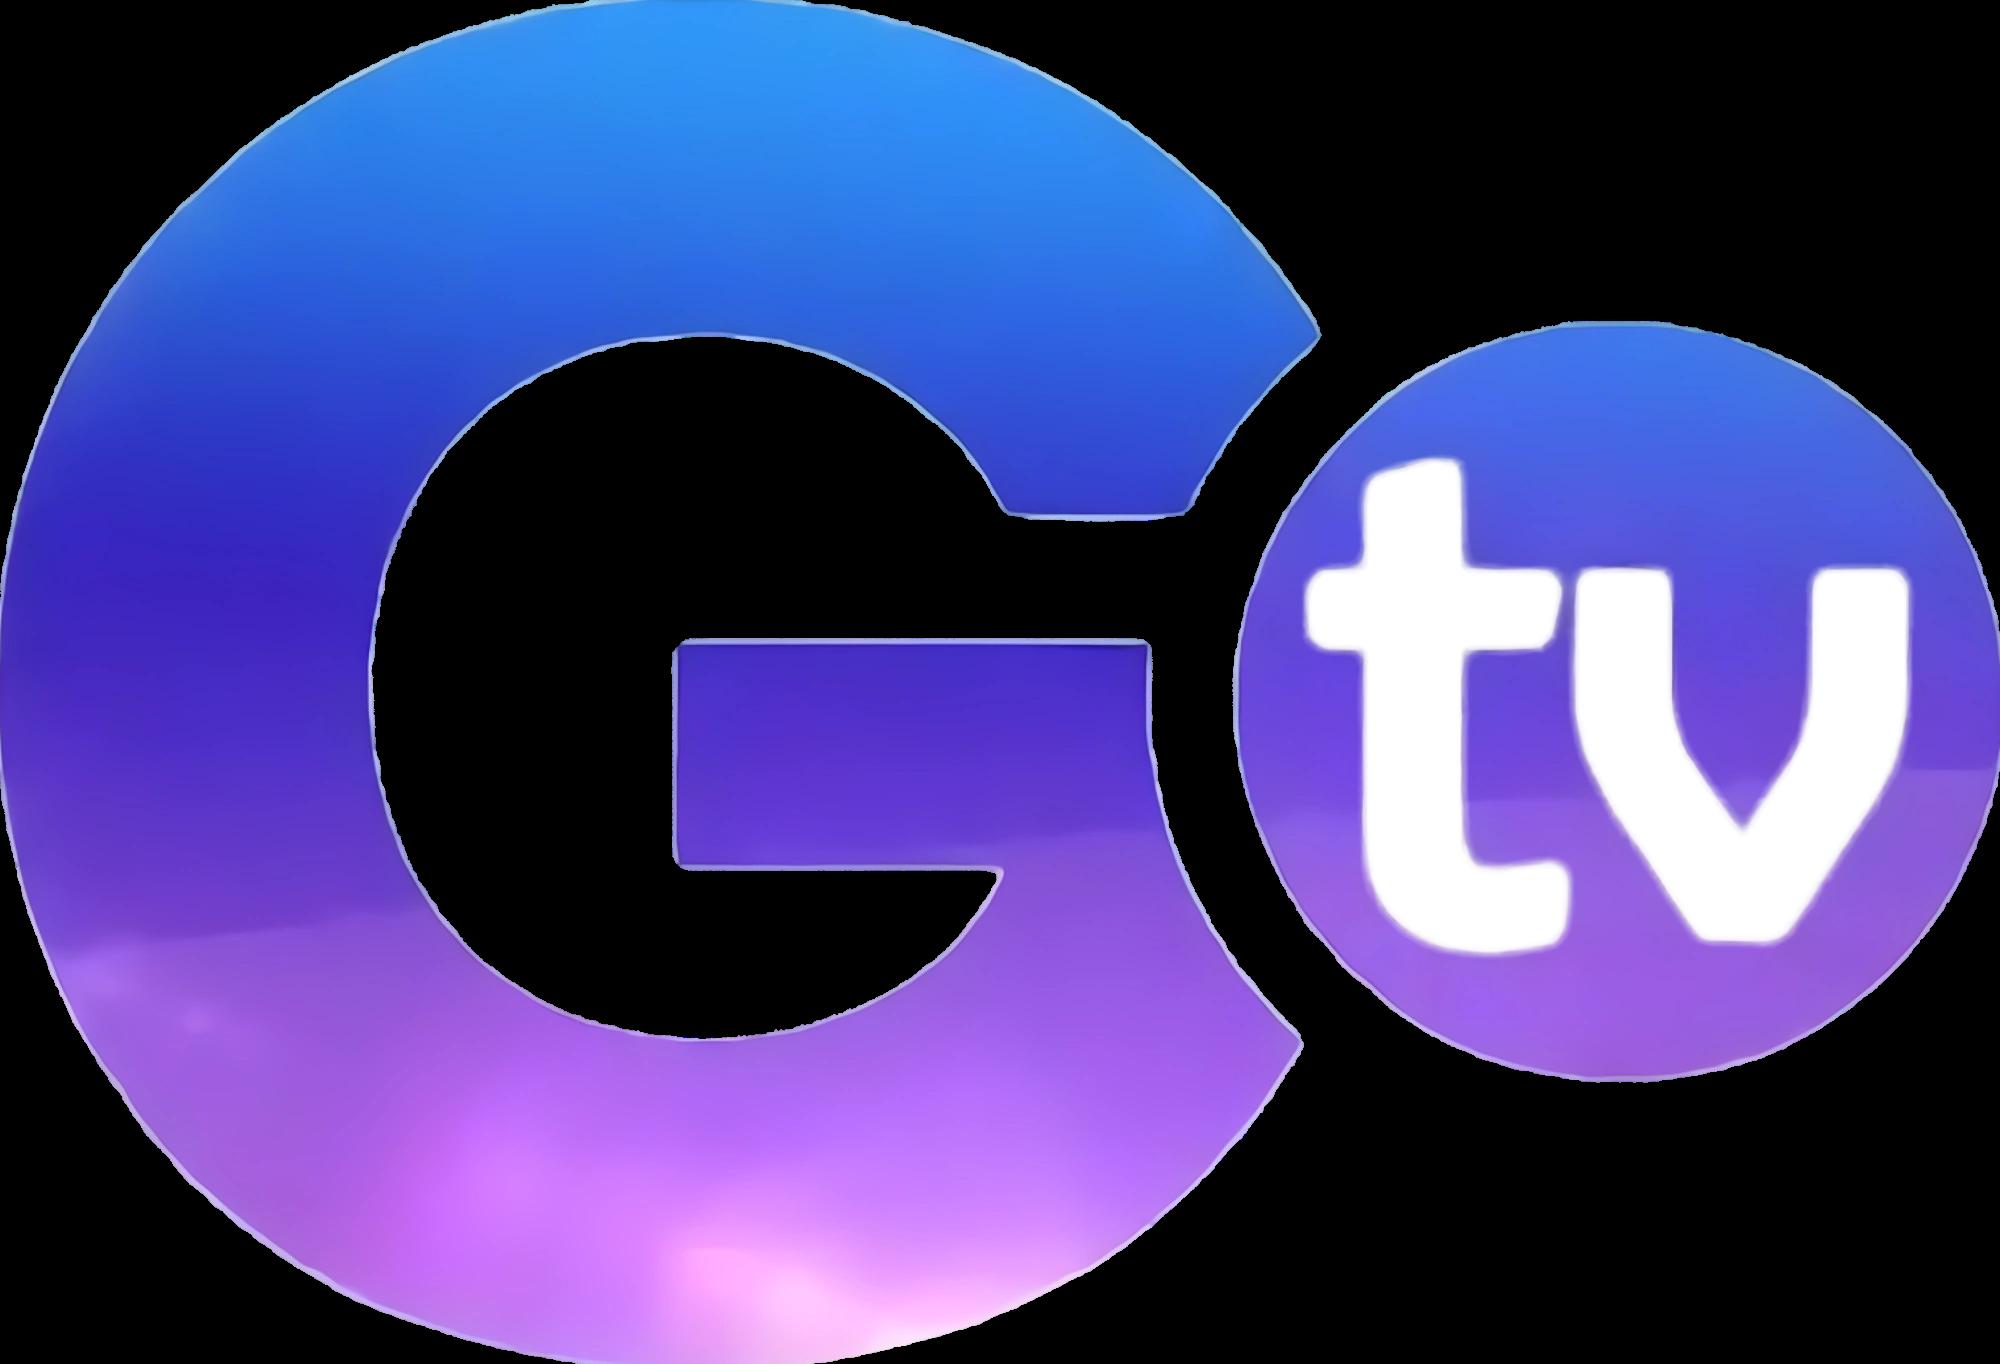 DWDG-TV Television station in Tuba, Benguet